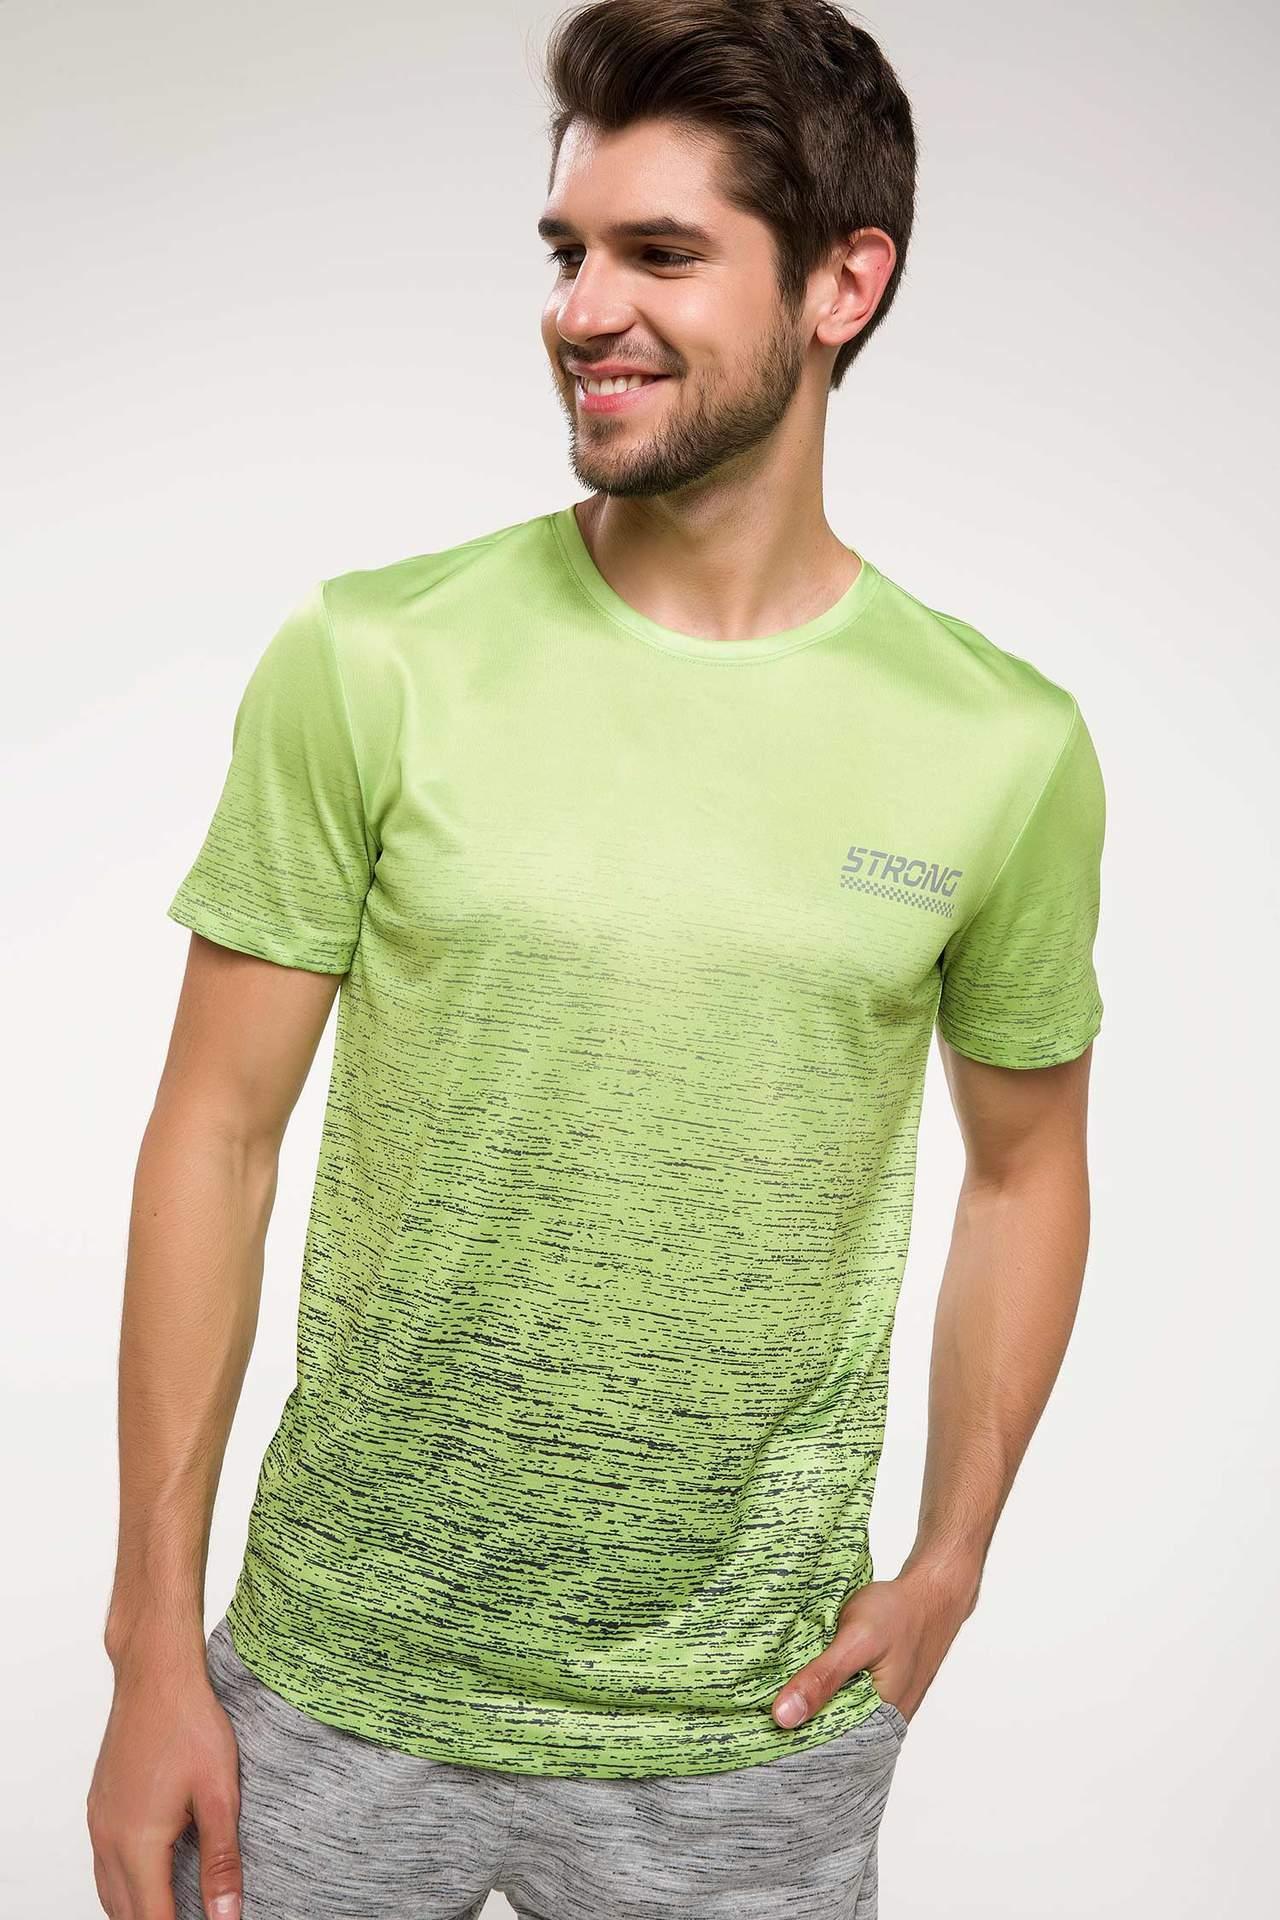 DeFacto Erkek Slim Fit Sporcu T-shirt Yeşil male